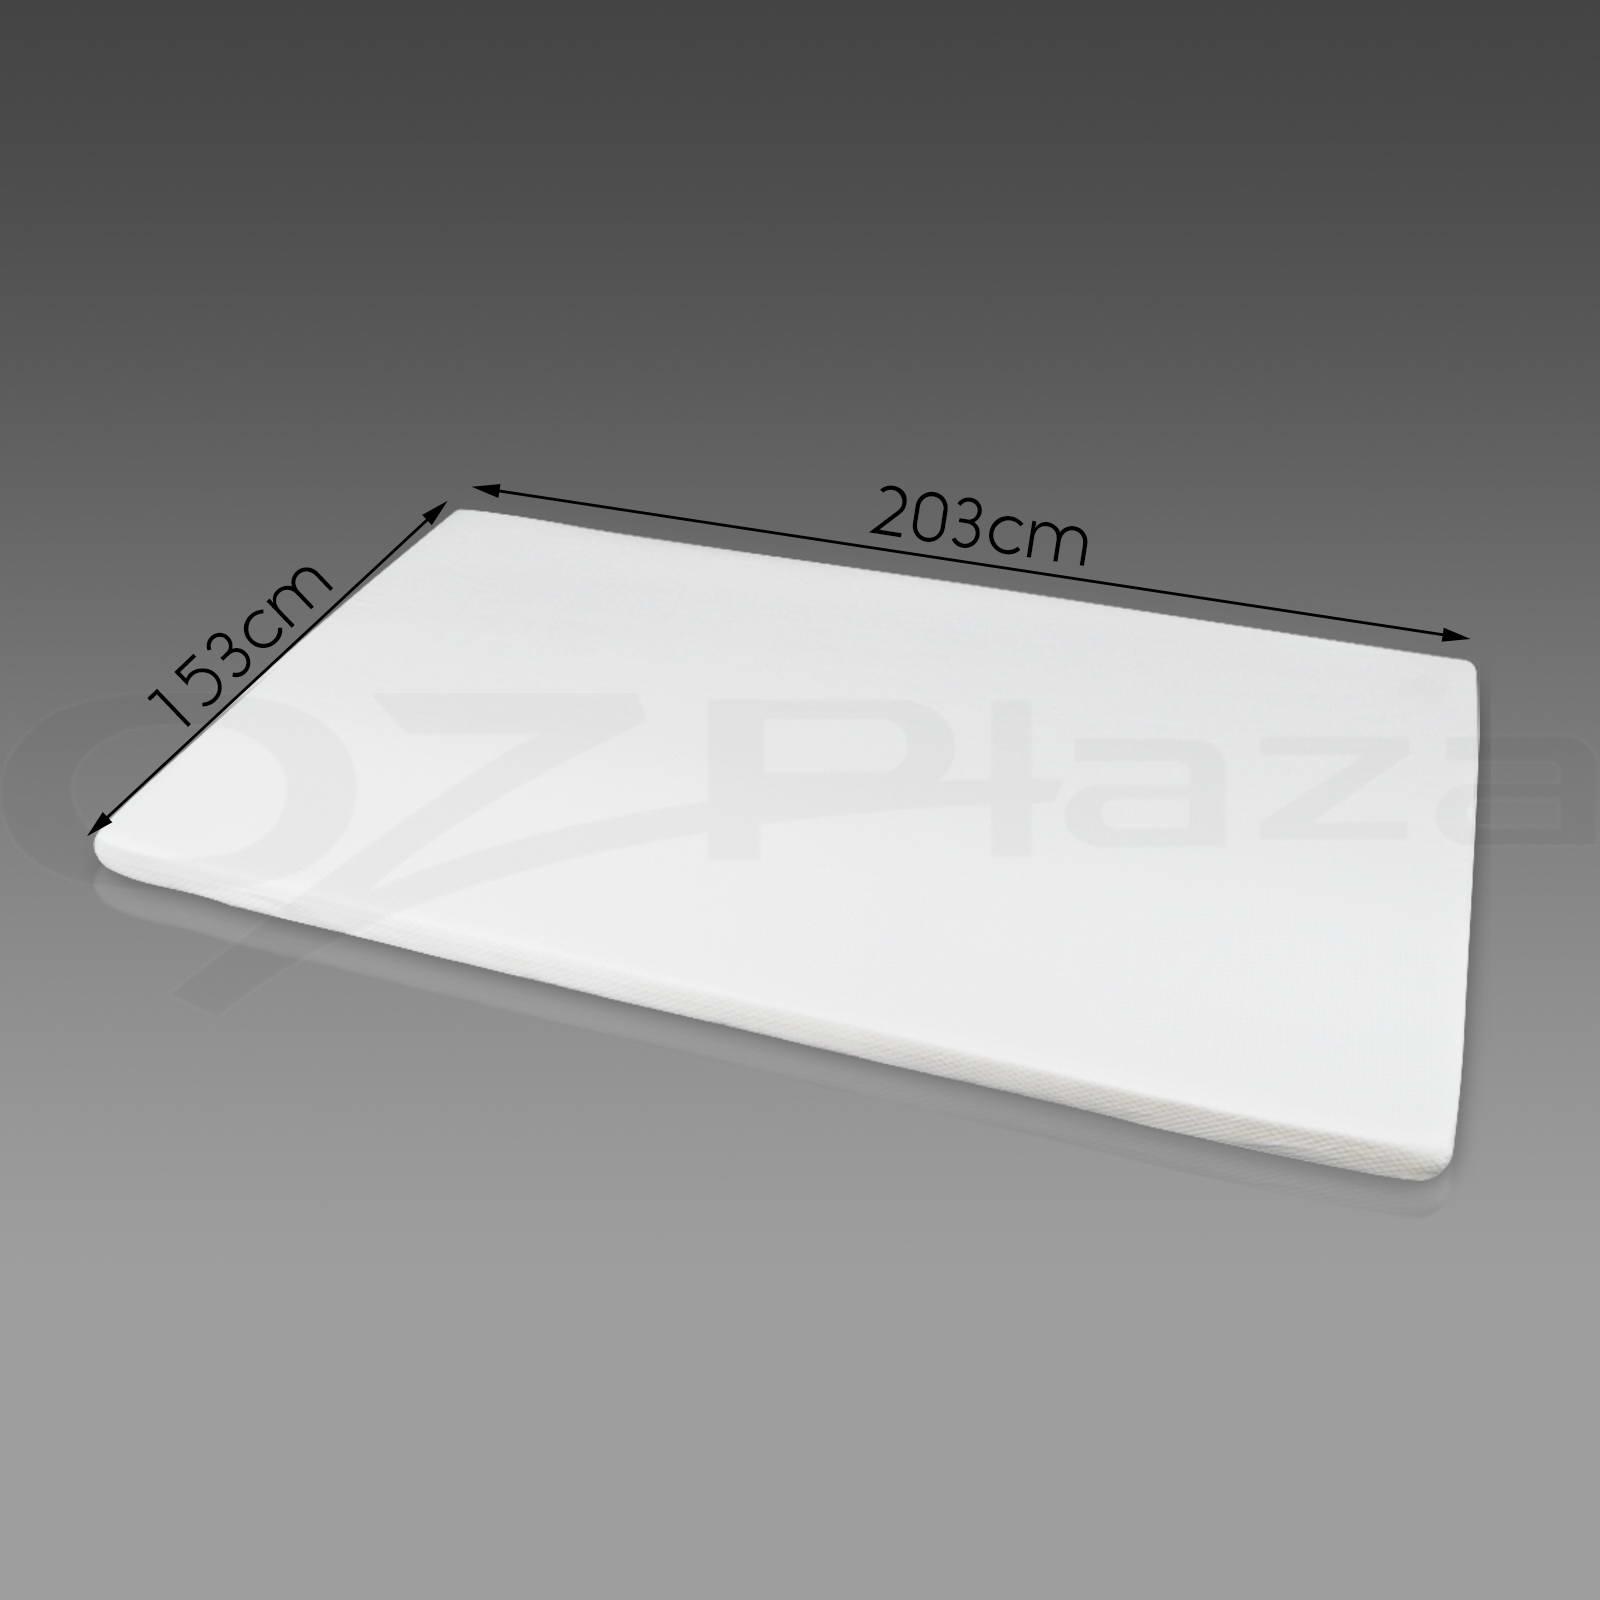 Memory Foam Mattress Topper Queen Size 5cm Visco Elastic Underlay Cover Ebay